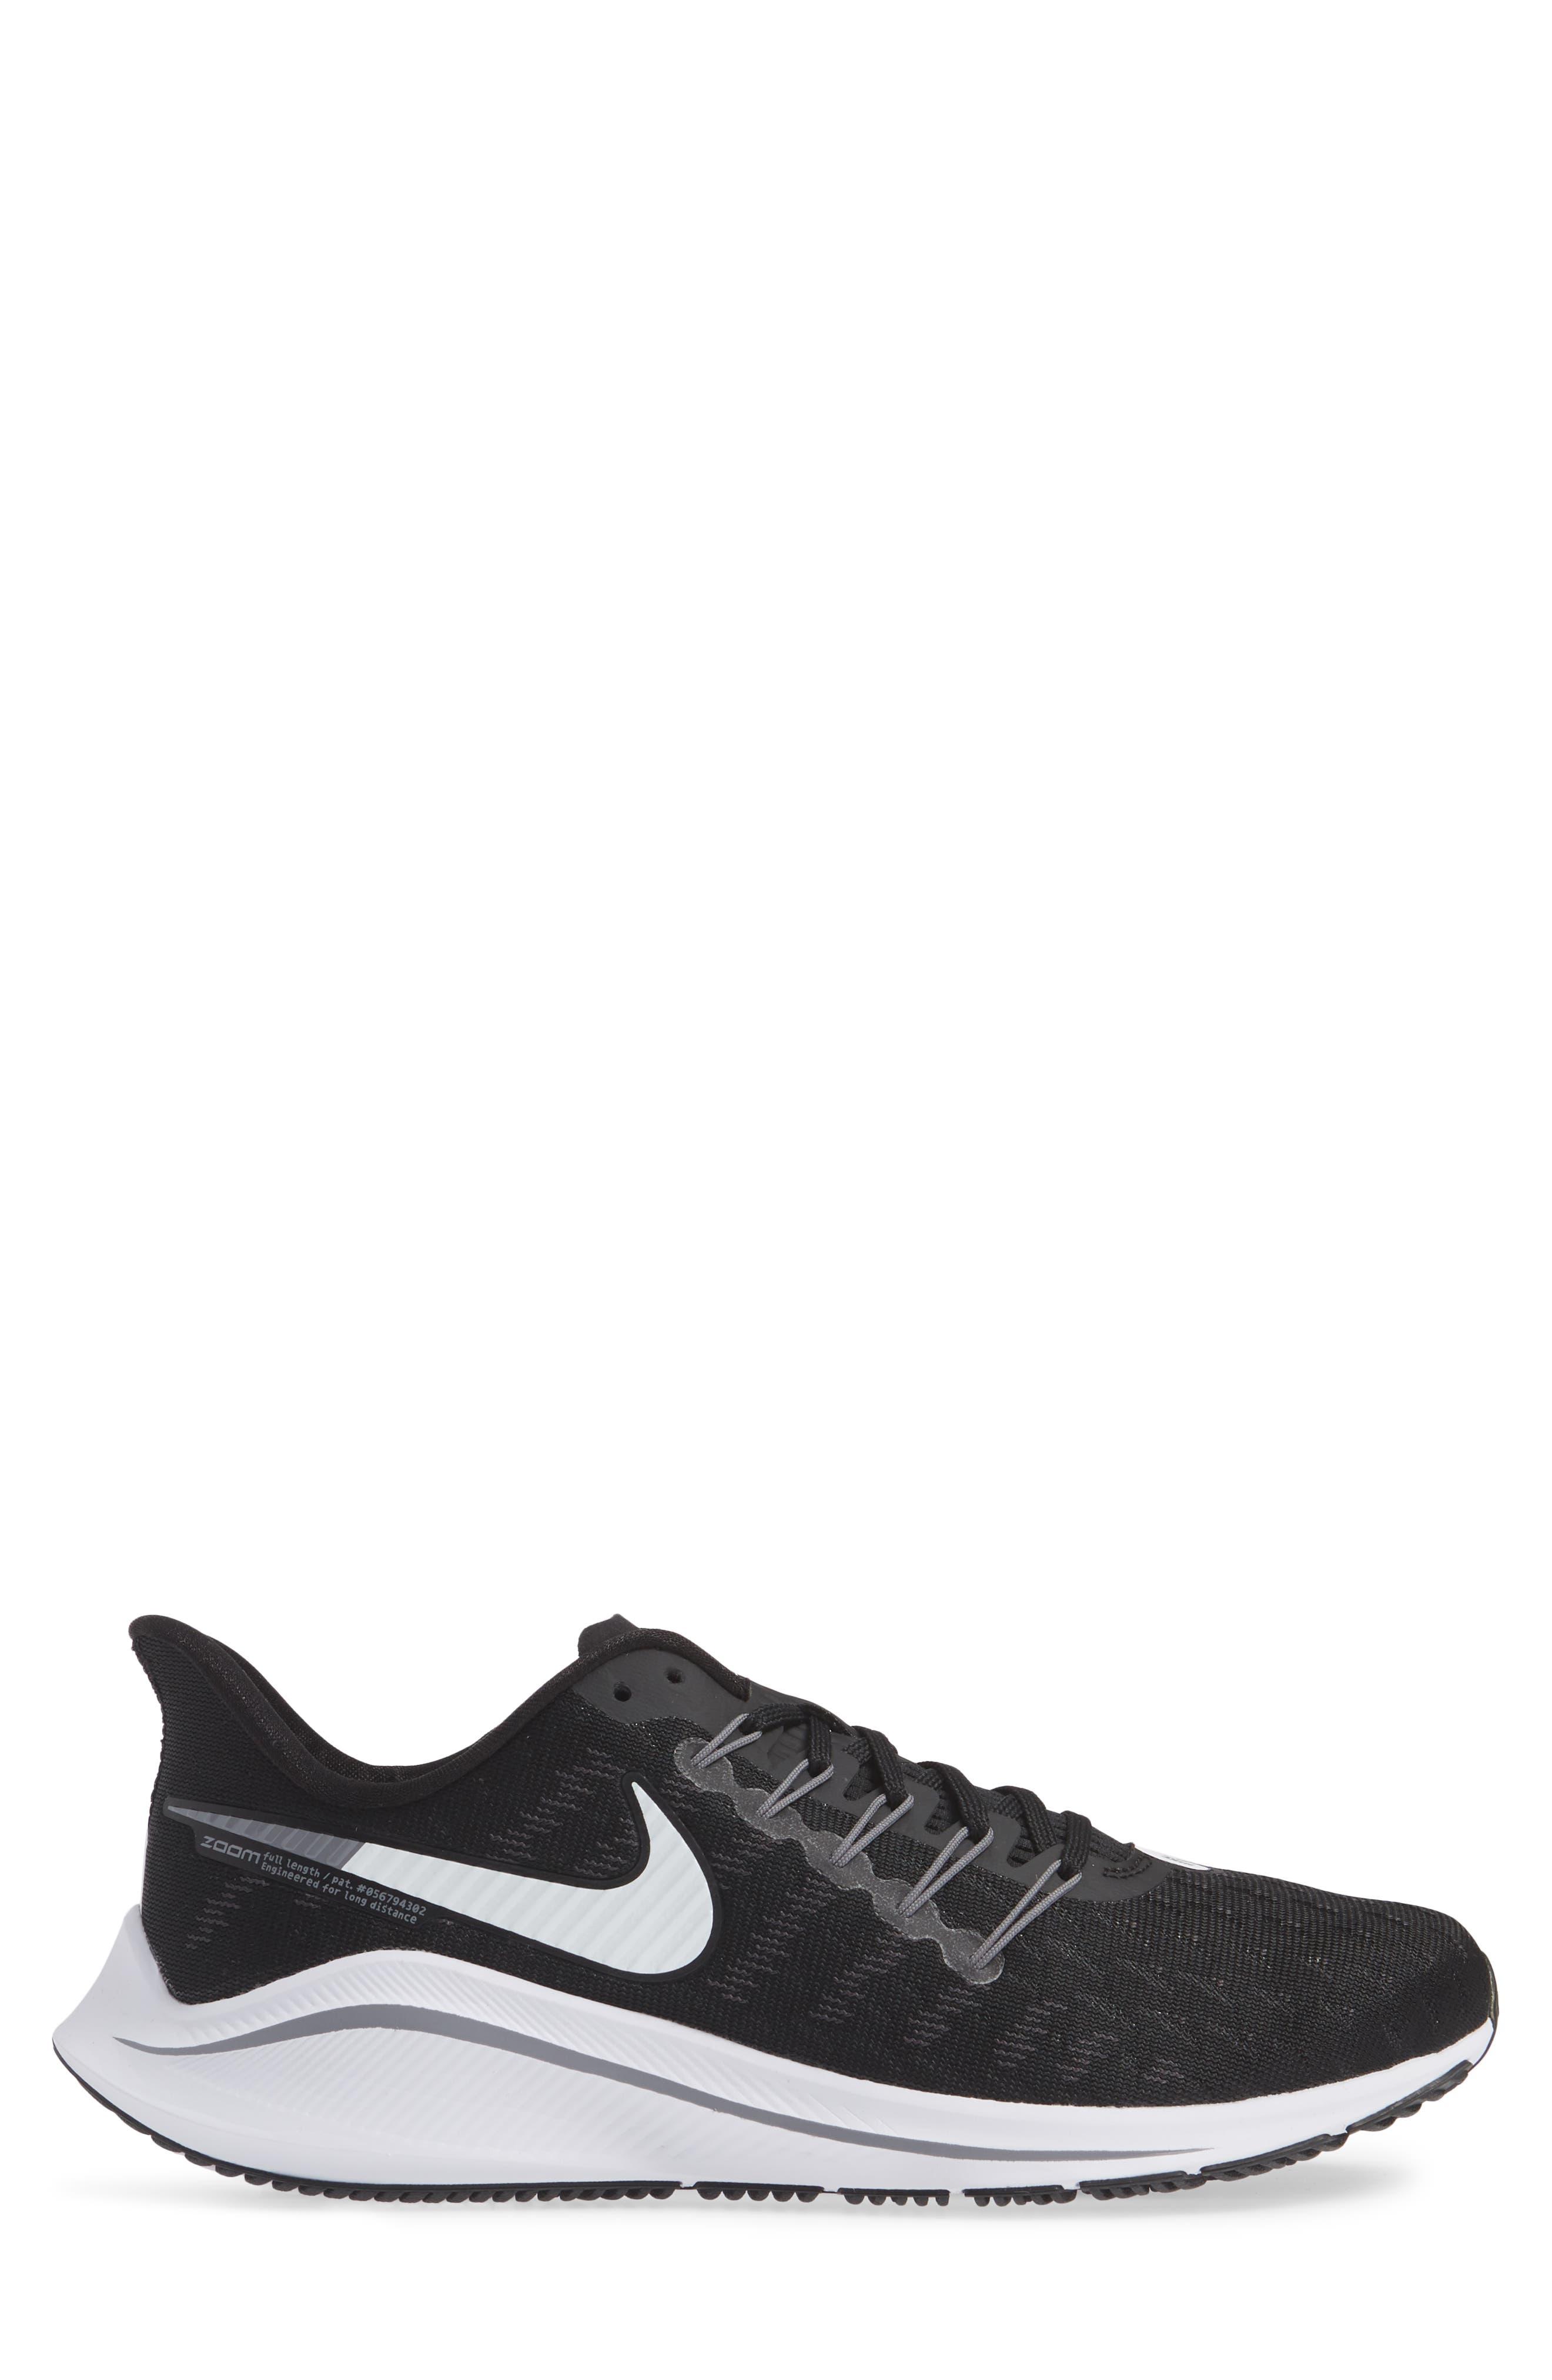 Air Zoom Vomero 14 Running Shoe,                             Alternate thumbnail 3, color,                             BLACK/ WHITE/ THUNDER GREY